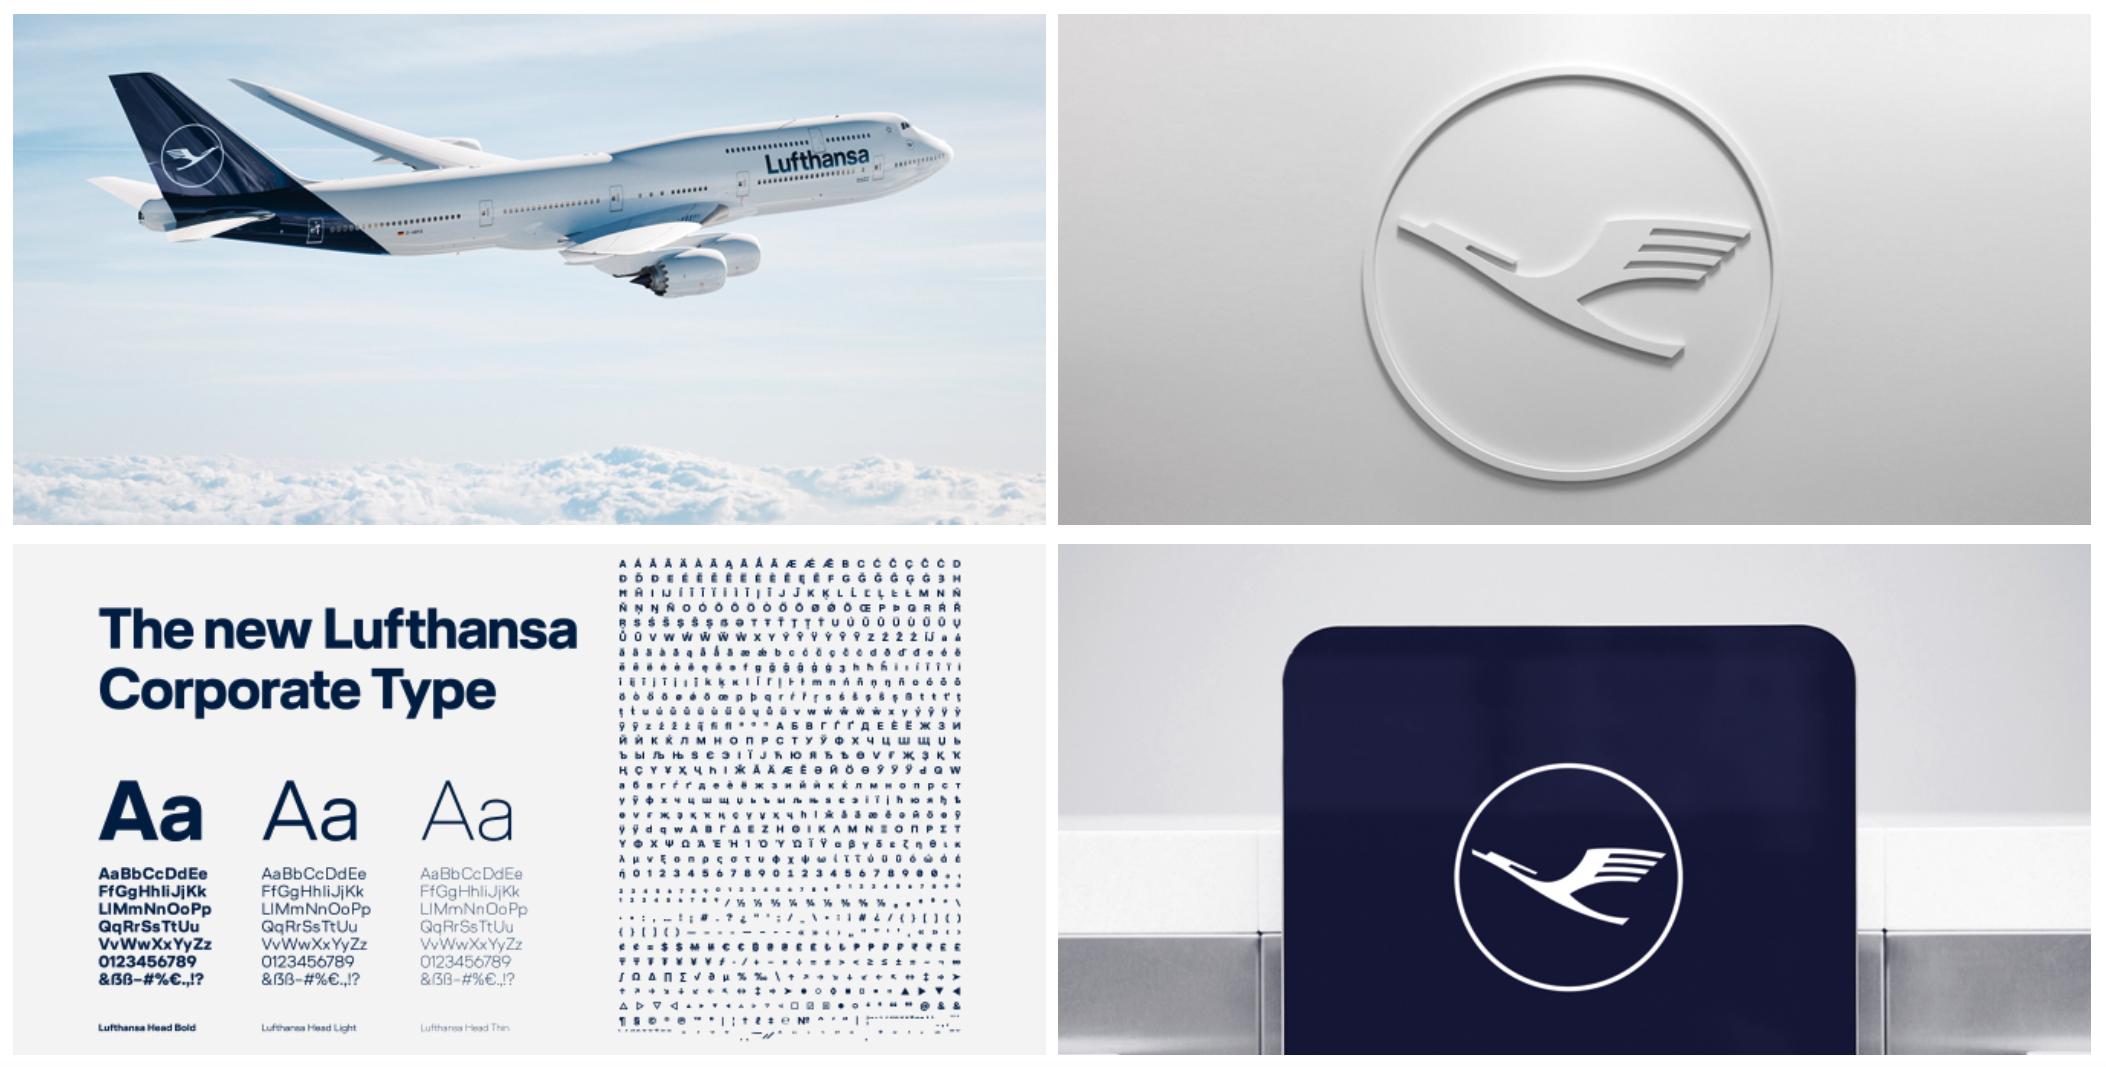 Lufthansa Branding